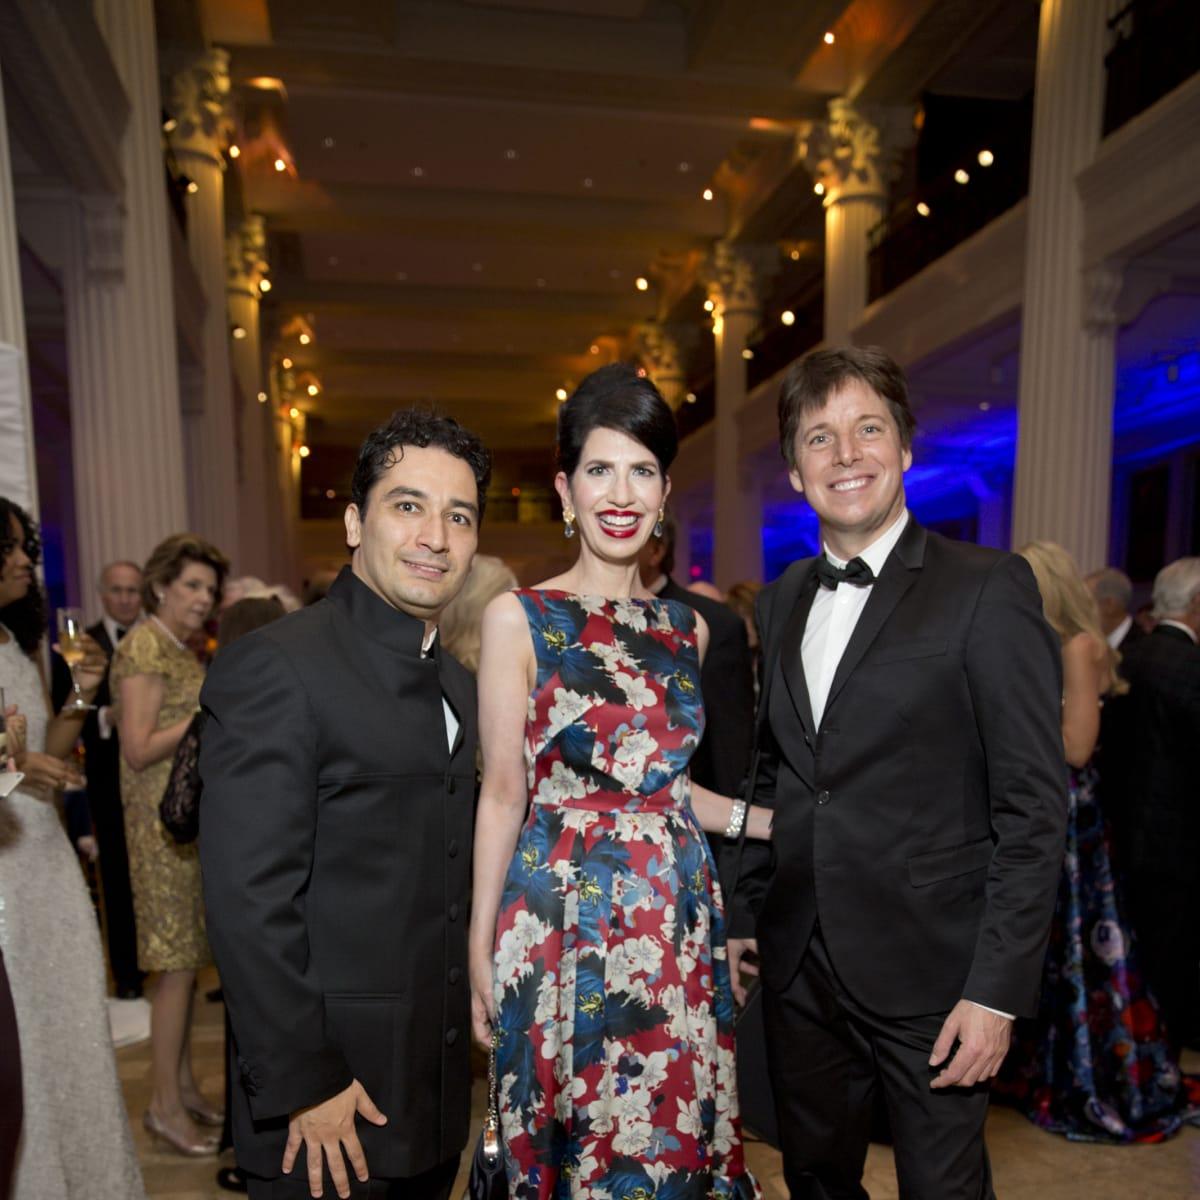 News, Shelby, Houston Symphony Opening Night, Sept. 2015, Andres Orozco-Estrada, Kelli Cohen Fein, Joshua Bell